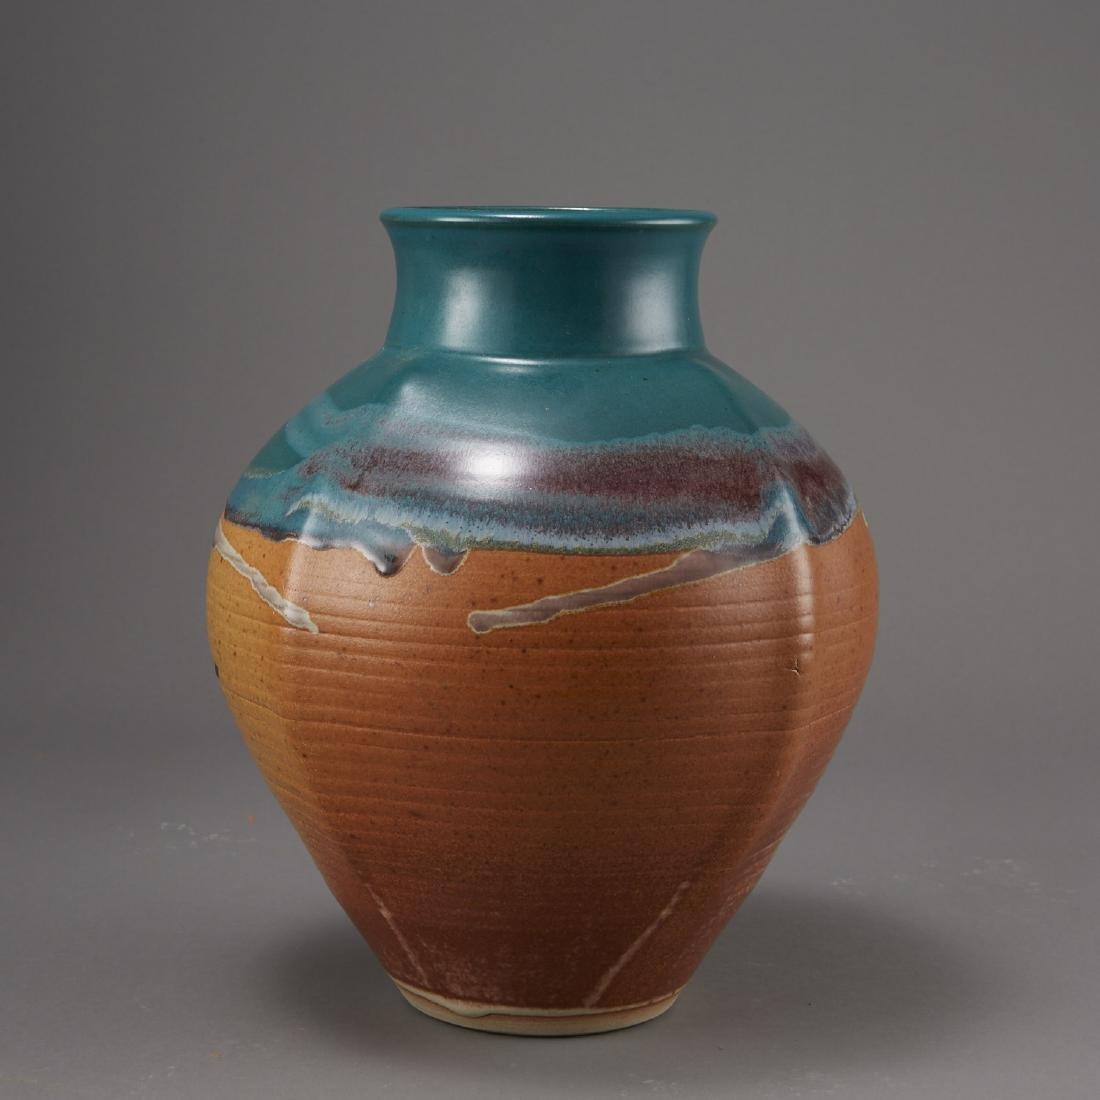 6 Pueblo Pottery Pots incld Fragua, Nez, Medina - 7